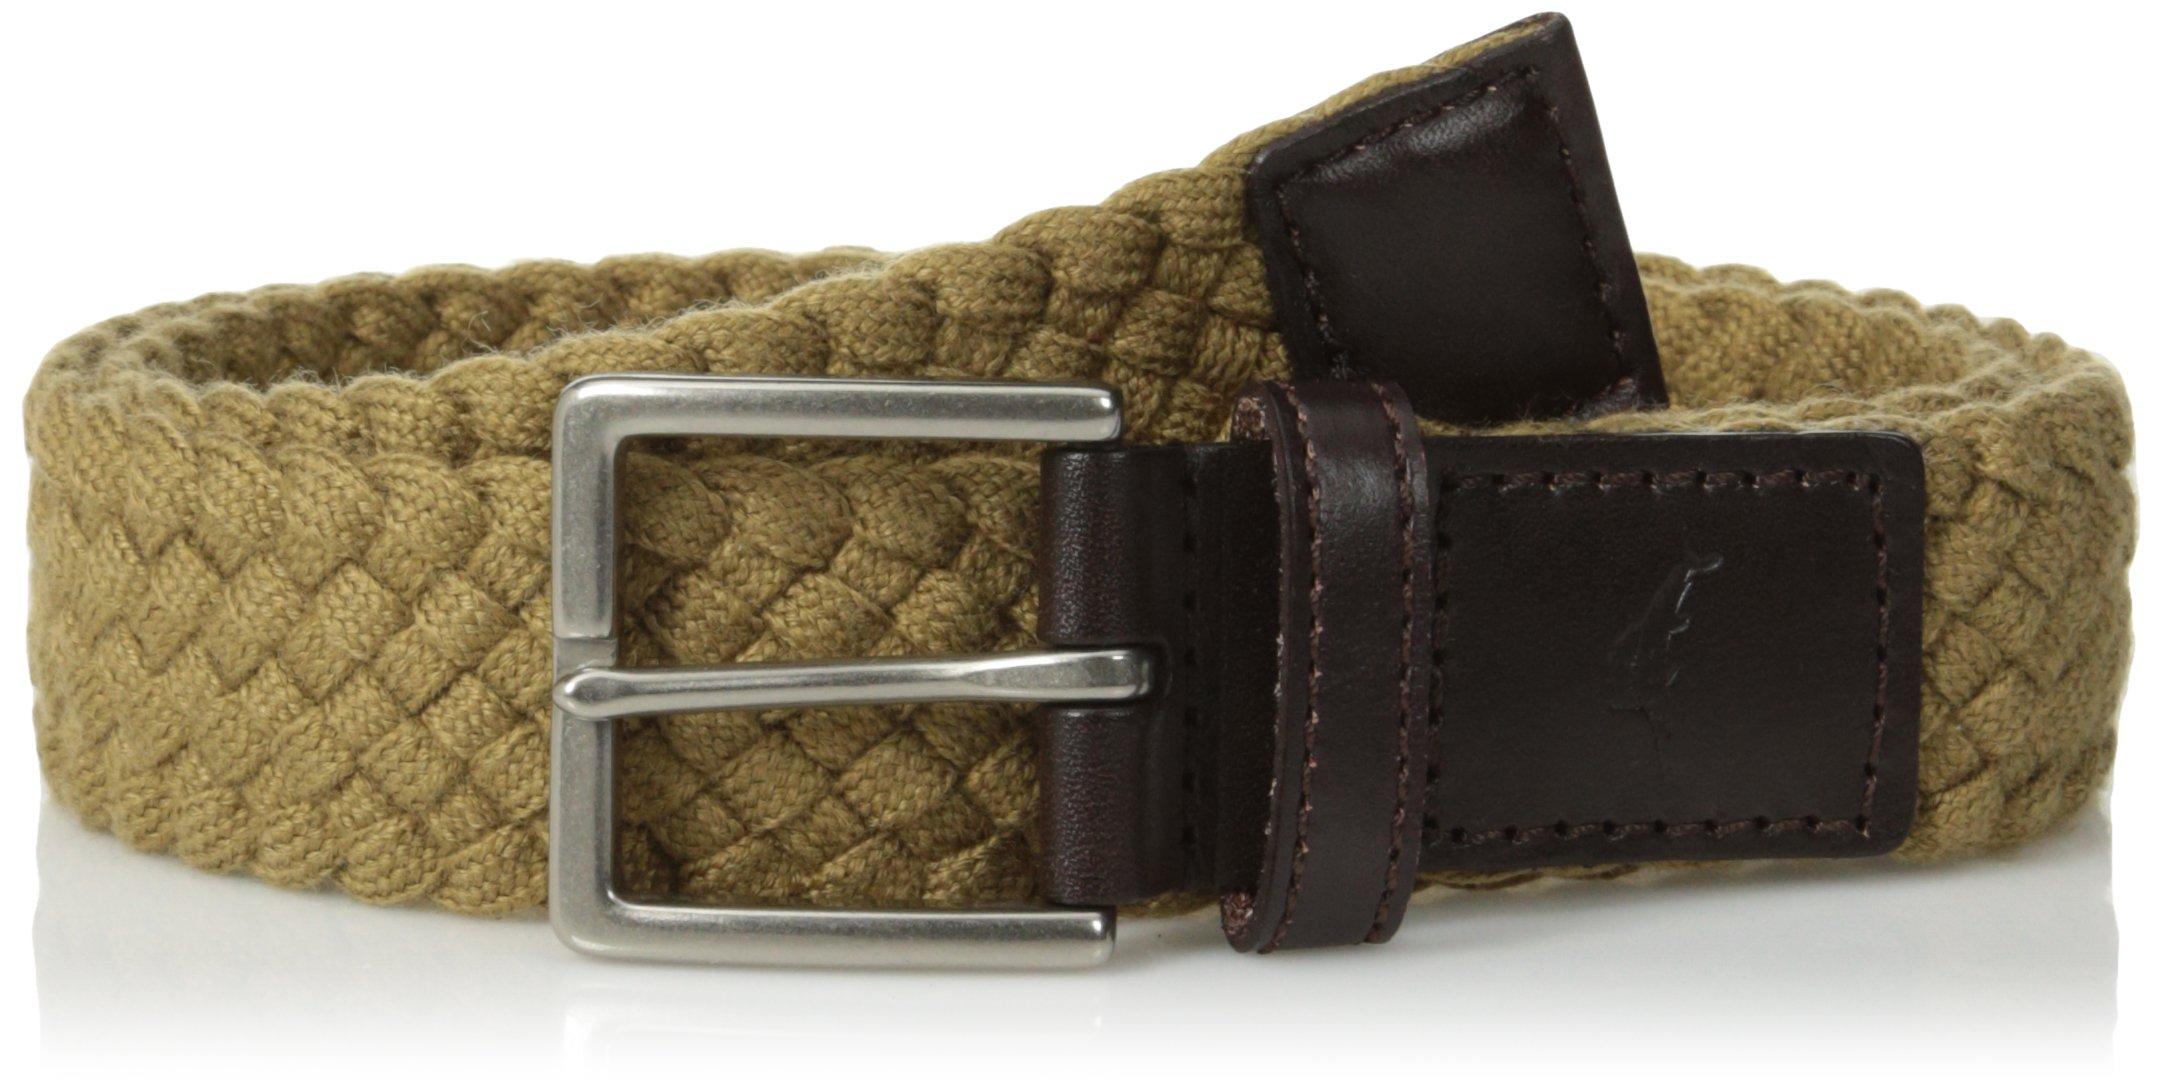 Tommy Bahama Men's 1.5 in. Woven Braided Cotton Belt, khaki, X-Large